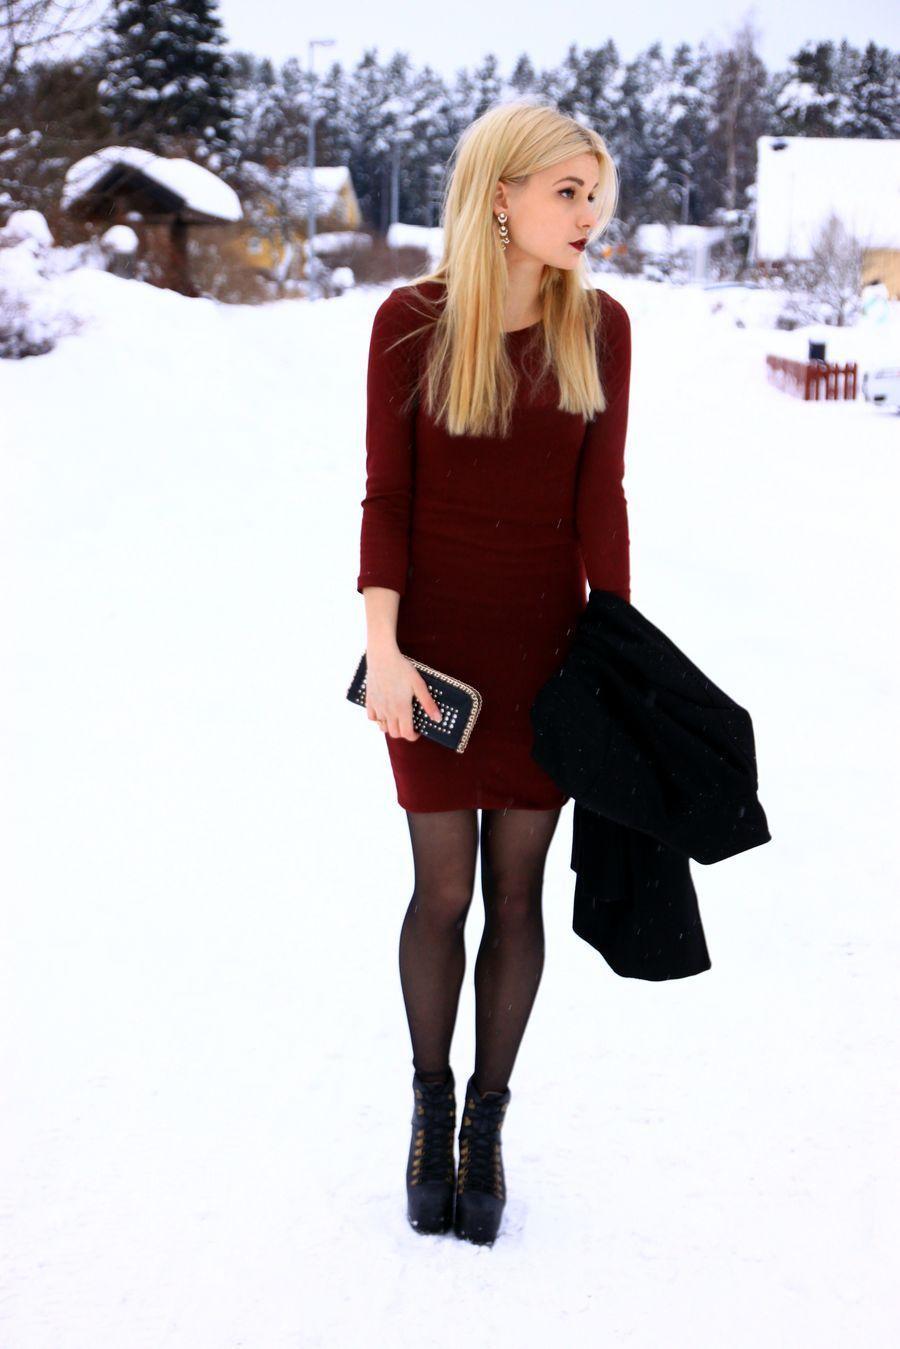 Burgundy Dress Merry Christmas By Linda Winter Dress Outfits Burgundy Dress Outfit Fashion [ 1349 x 900 Pixel ]